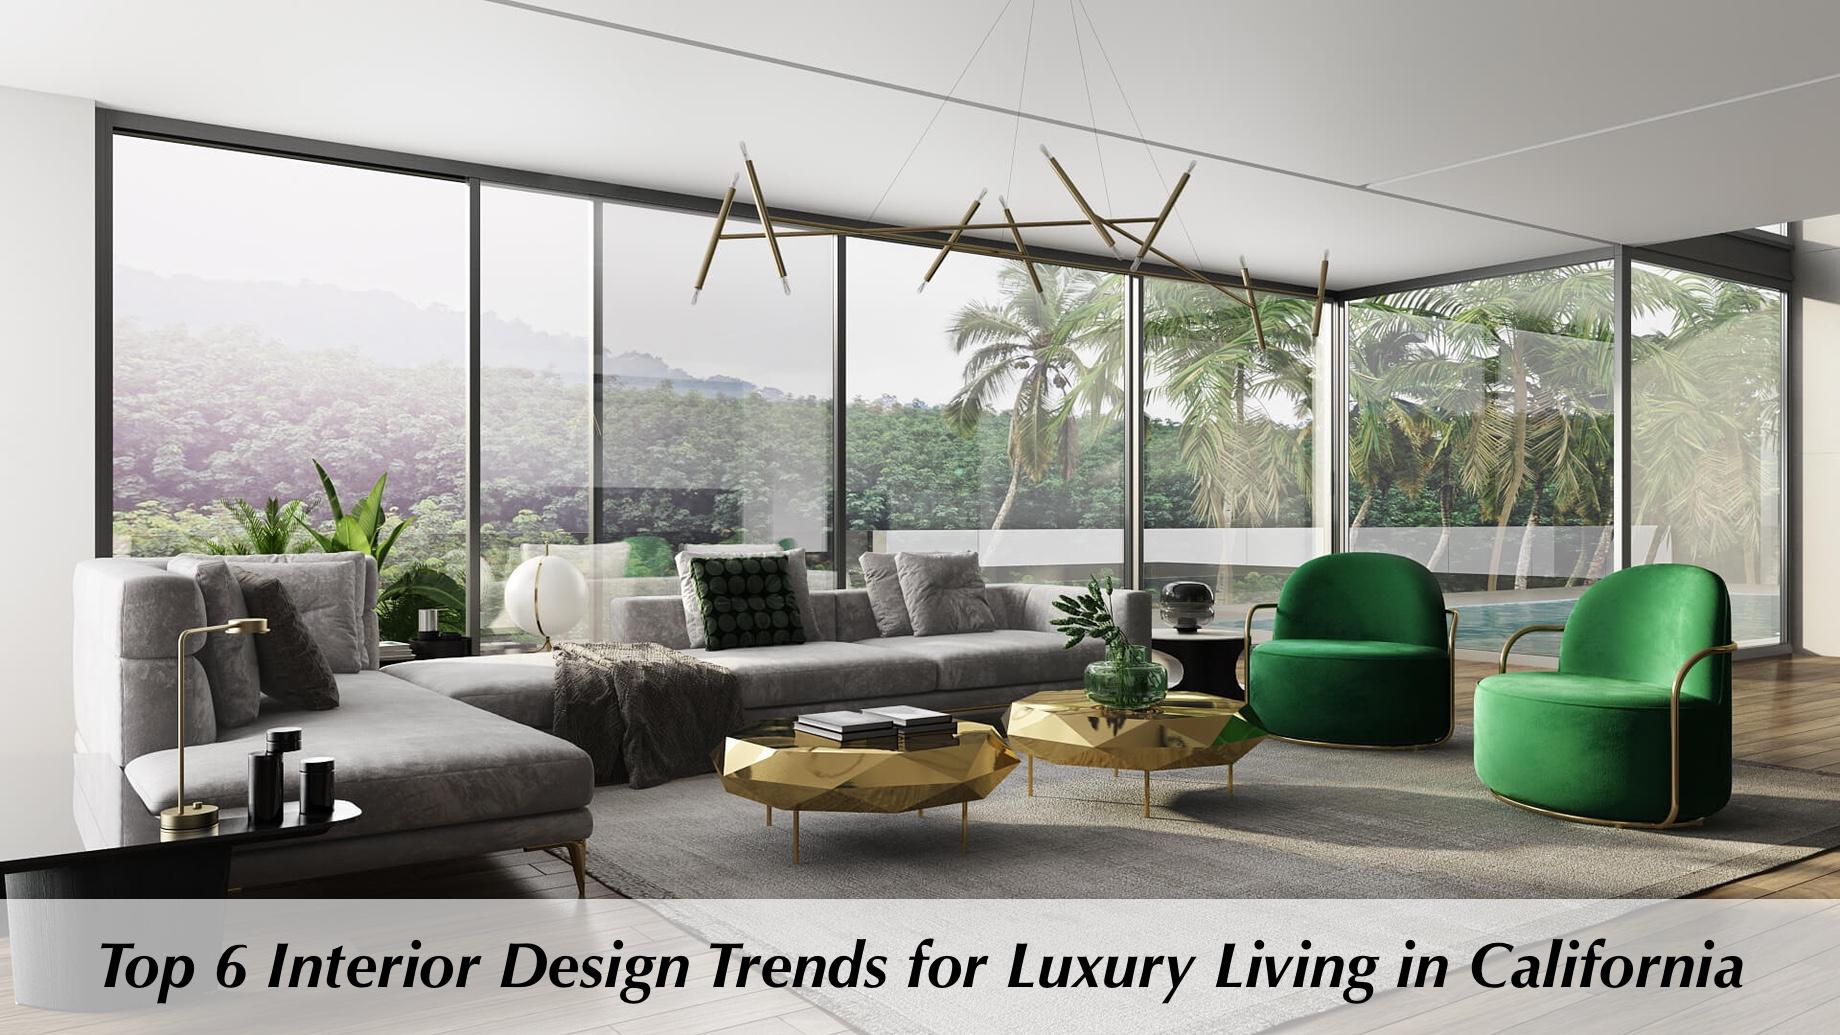 Top 6 Interior Design Trends for Luxury Living in California